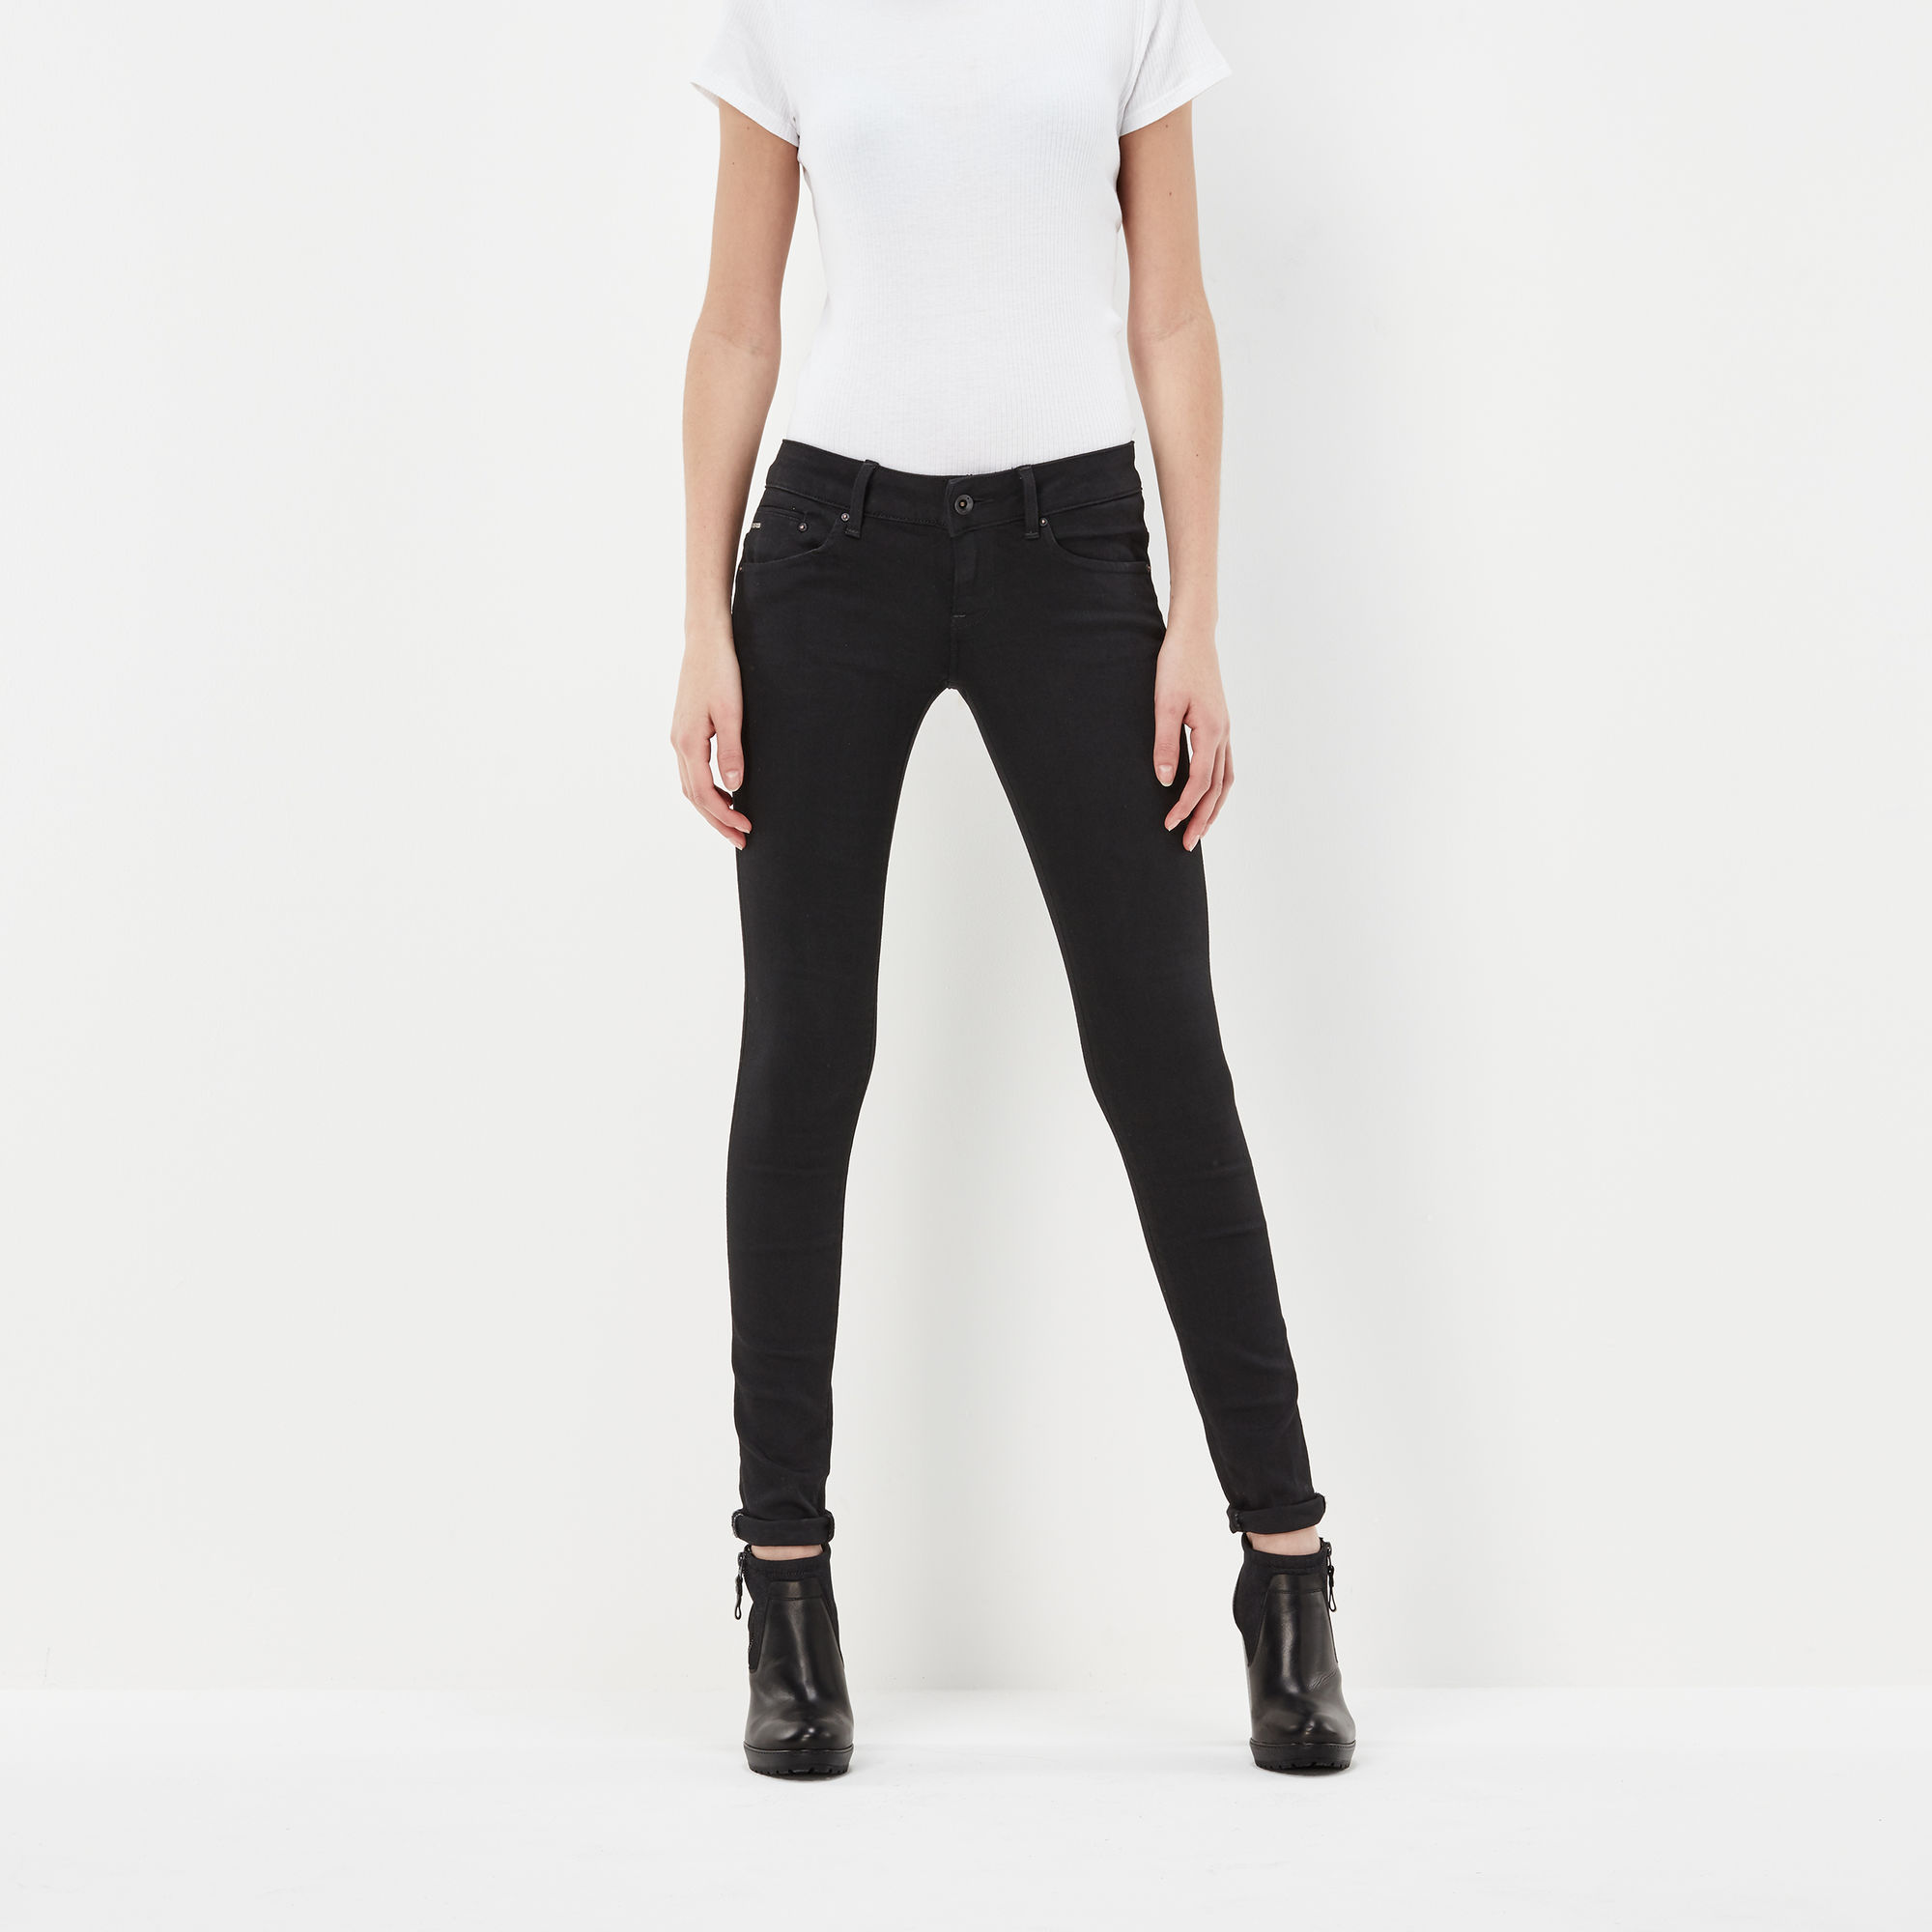 Image of G Star Raw Midge Zip Low Waist Super Skinny Jeans